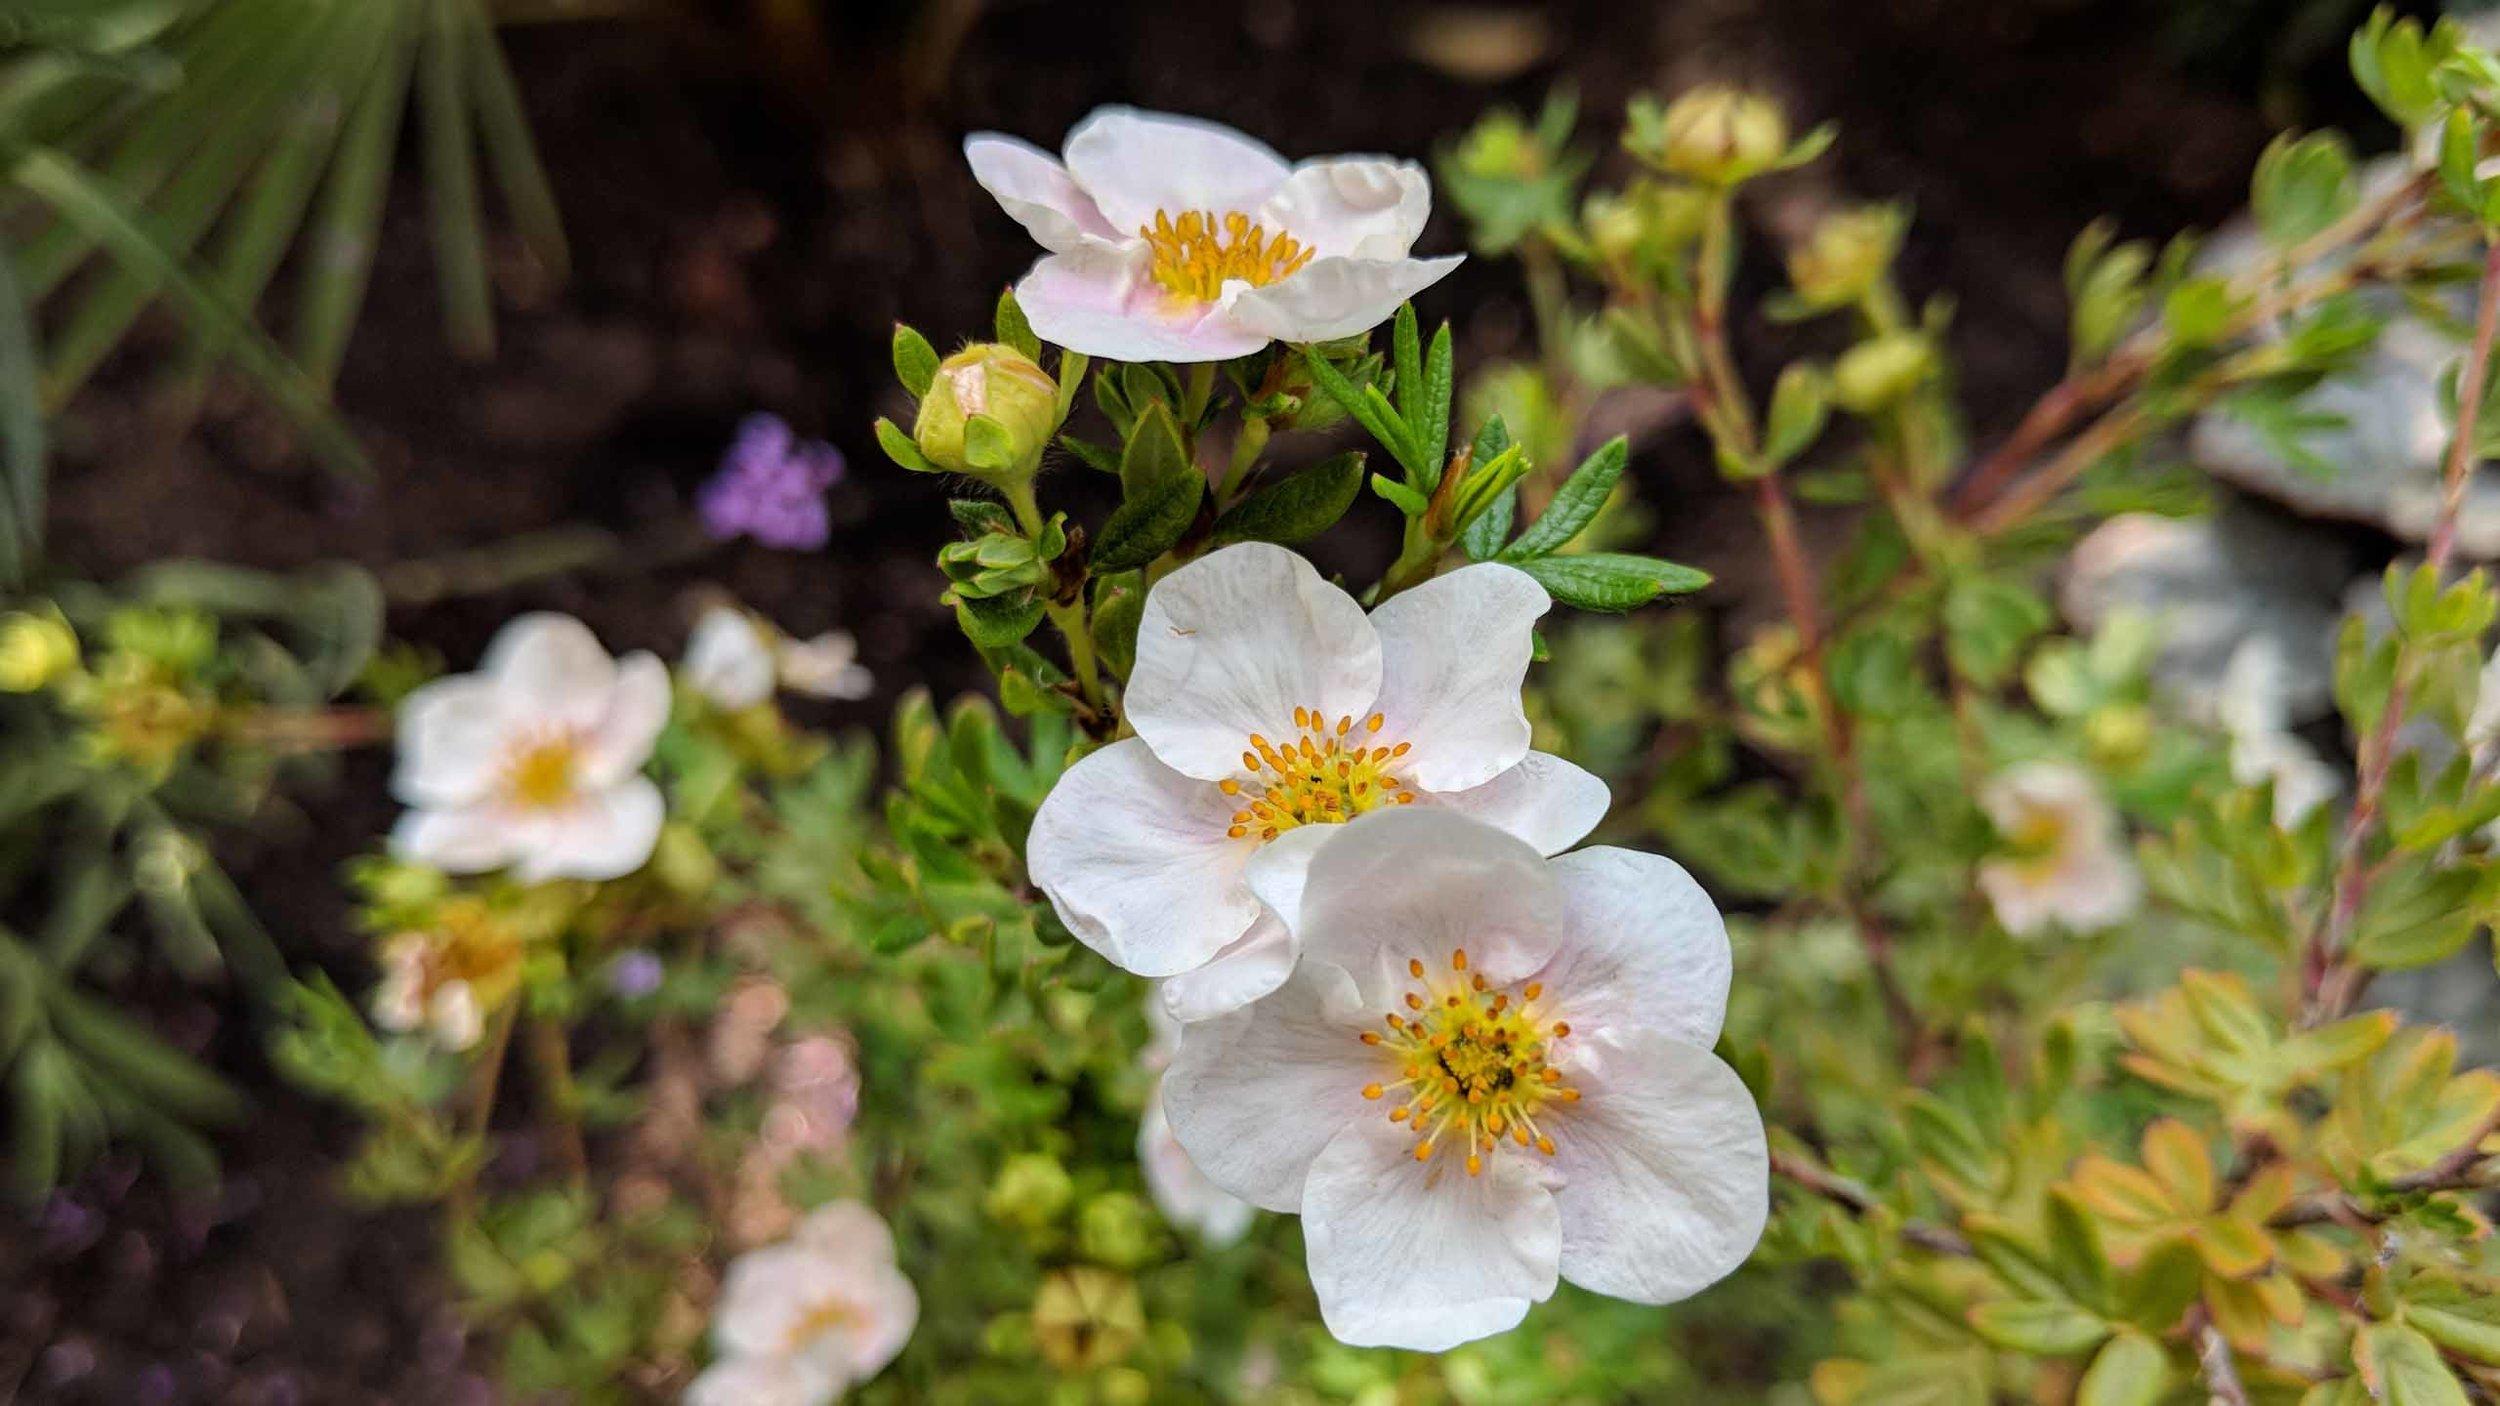 Cheshire Garden Design: Japanese garden: Potentilla fruticosa 'Abbotswood'